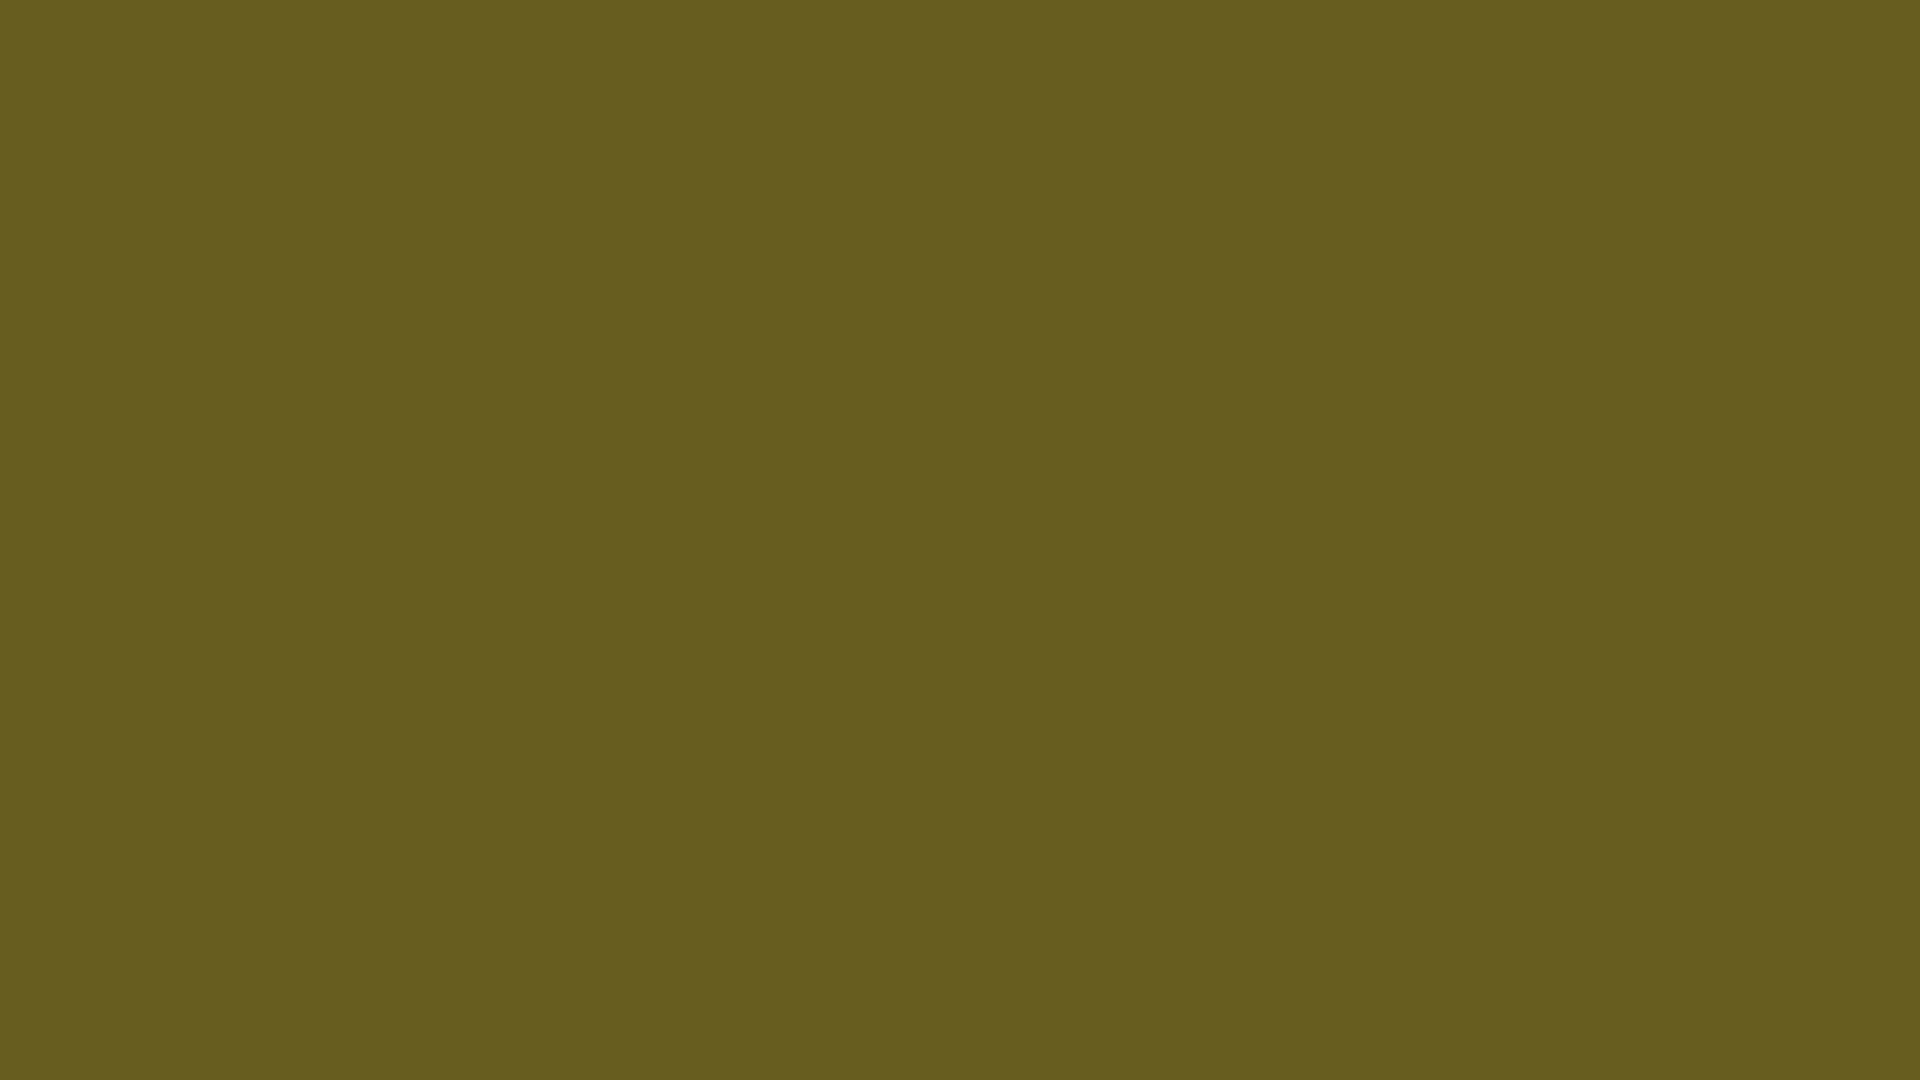 1920x1080 Antique Bronze Solid Color Background